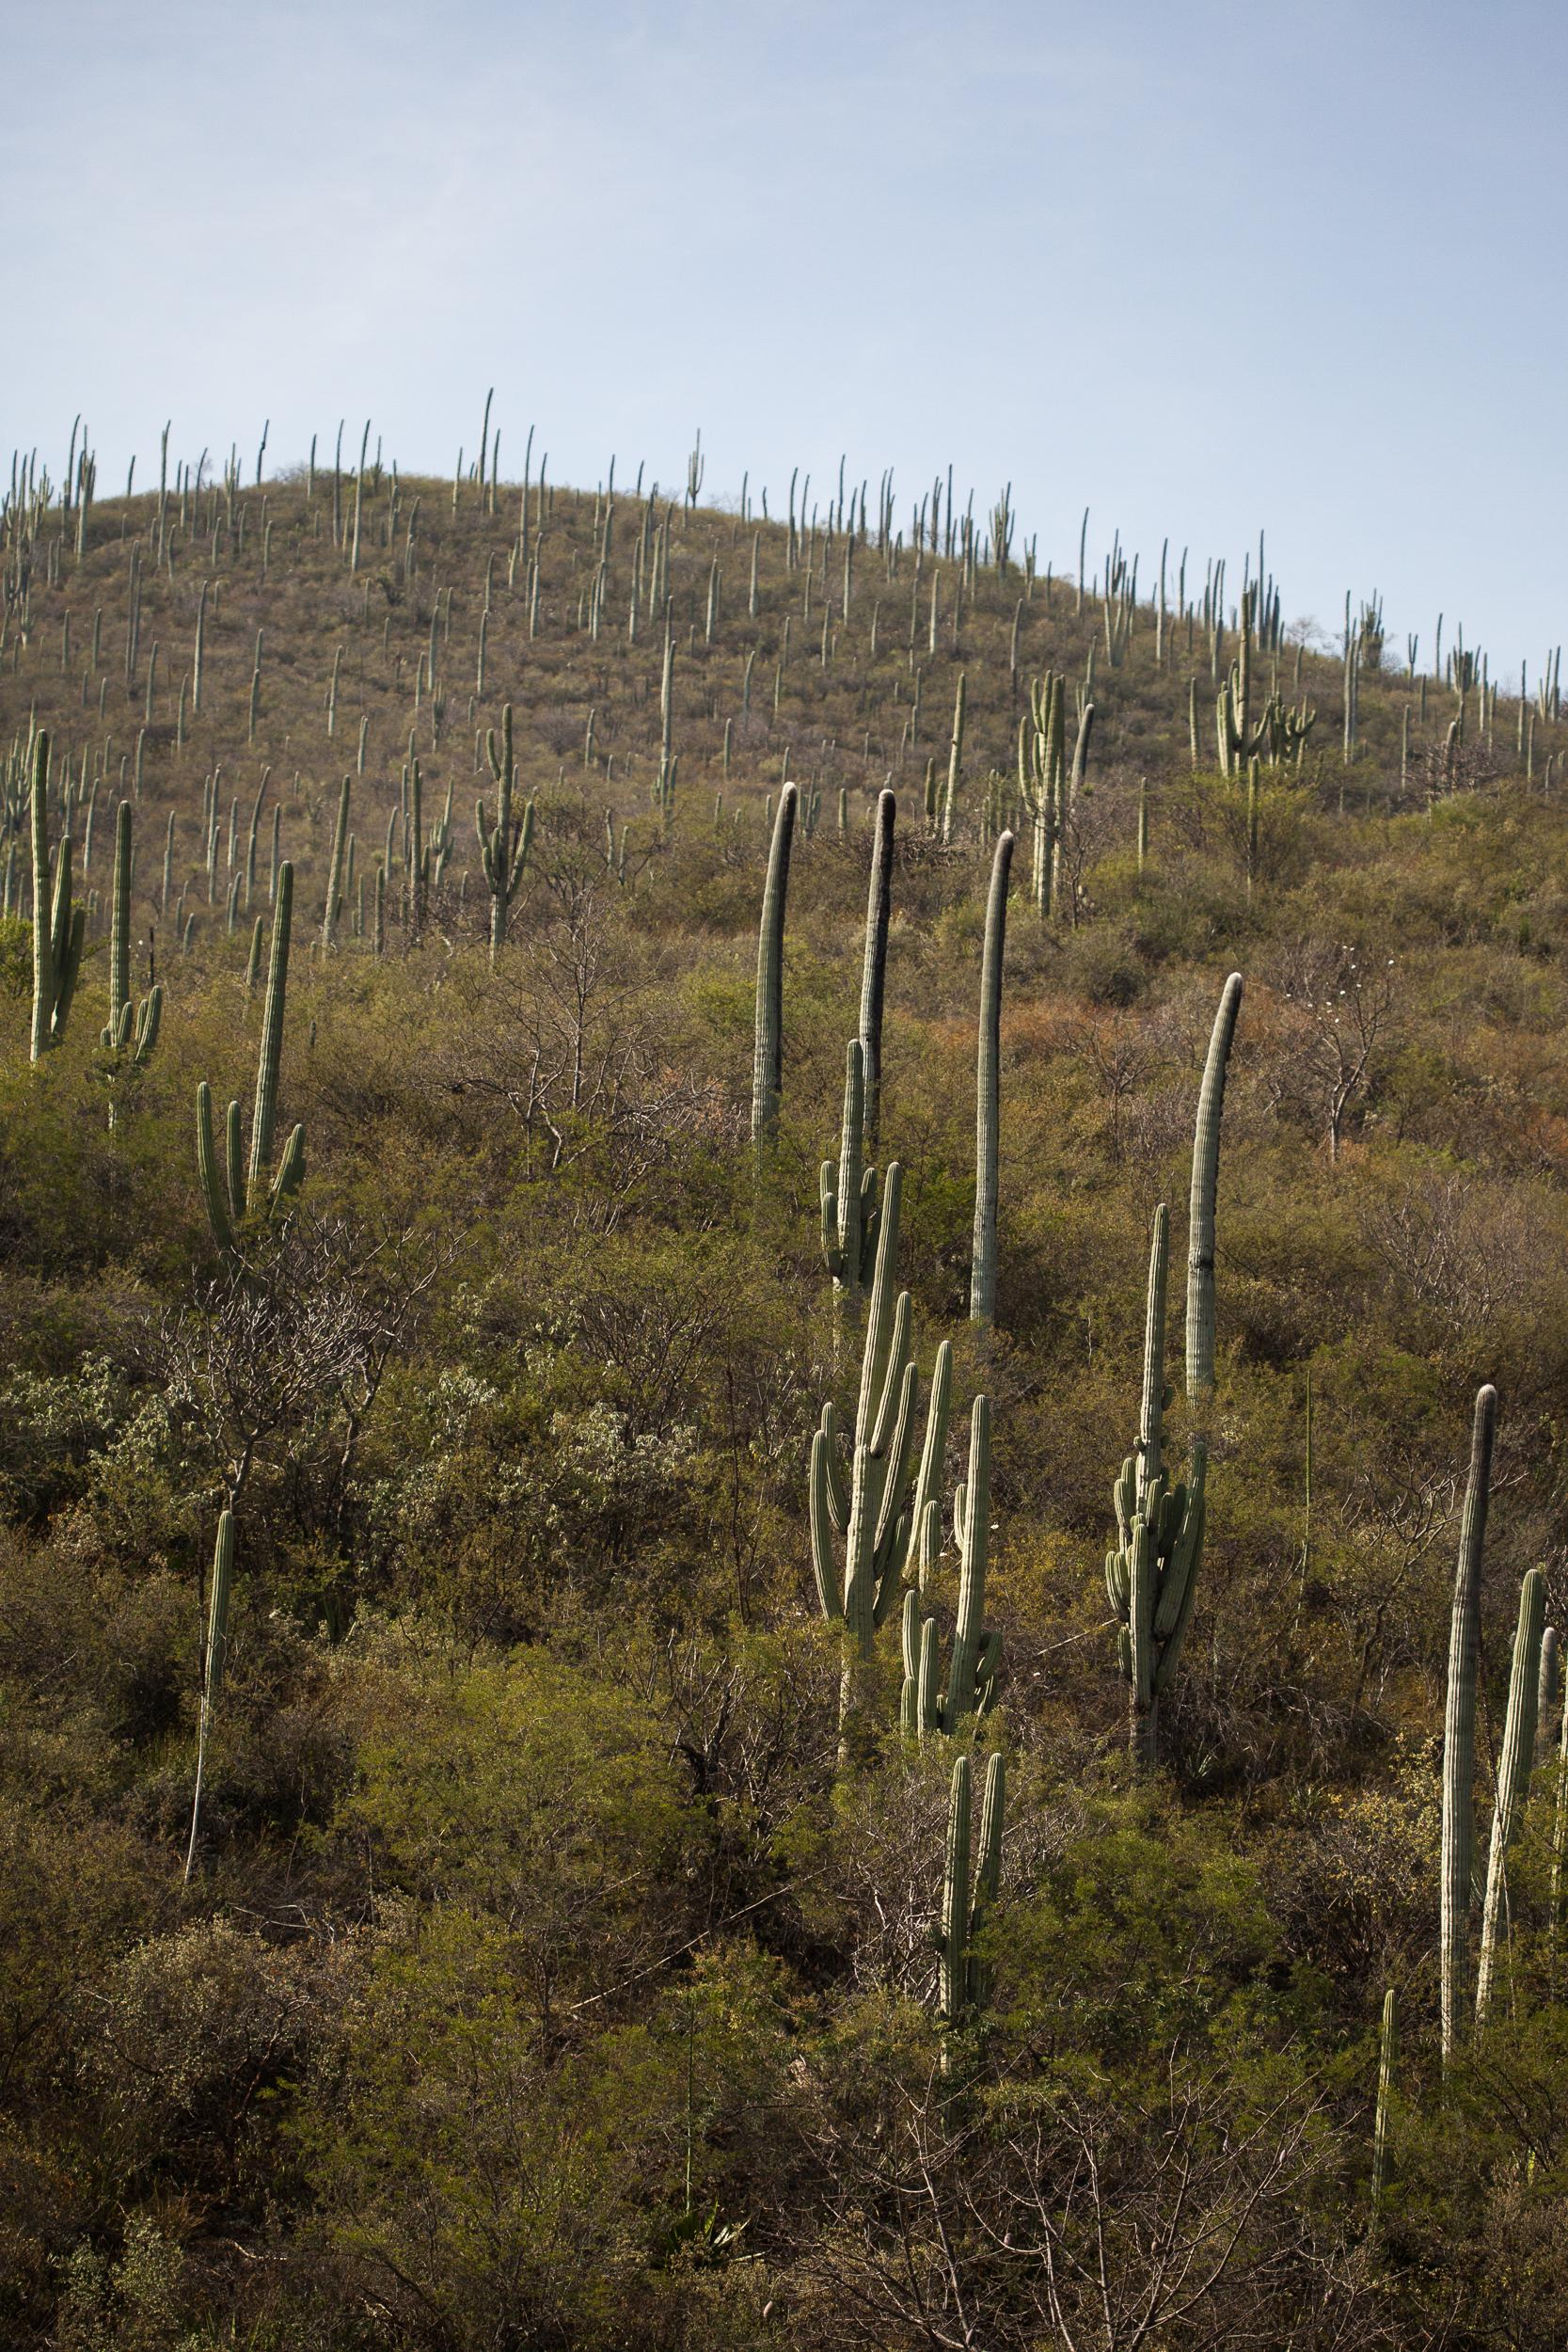 Chacon Images_Oaxaca_Travel_WEB_-1748.jpg